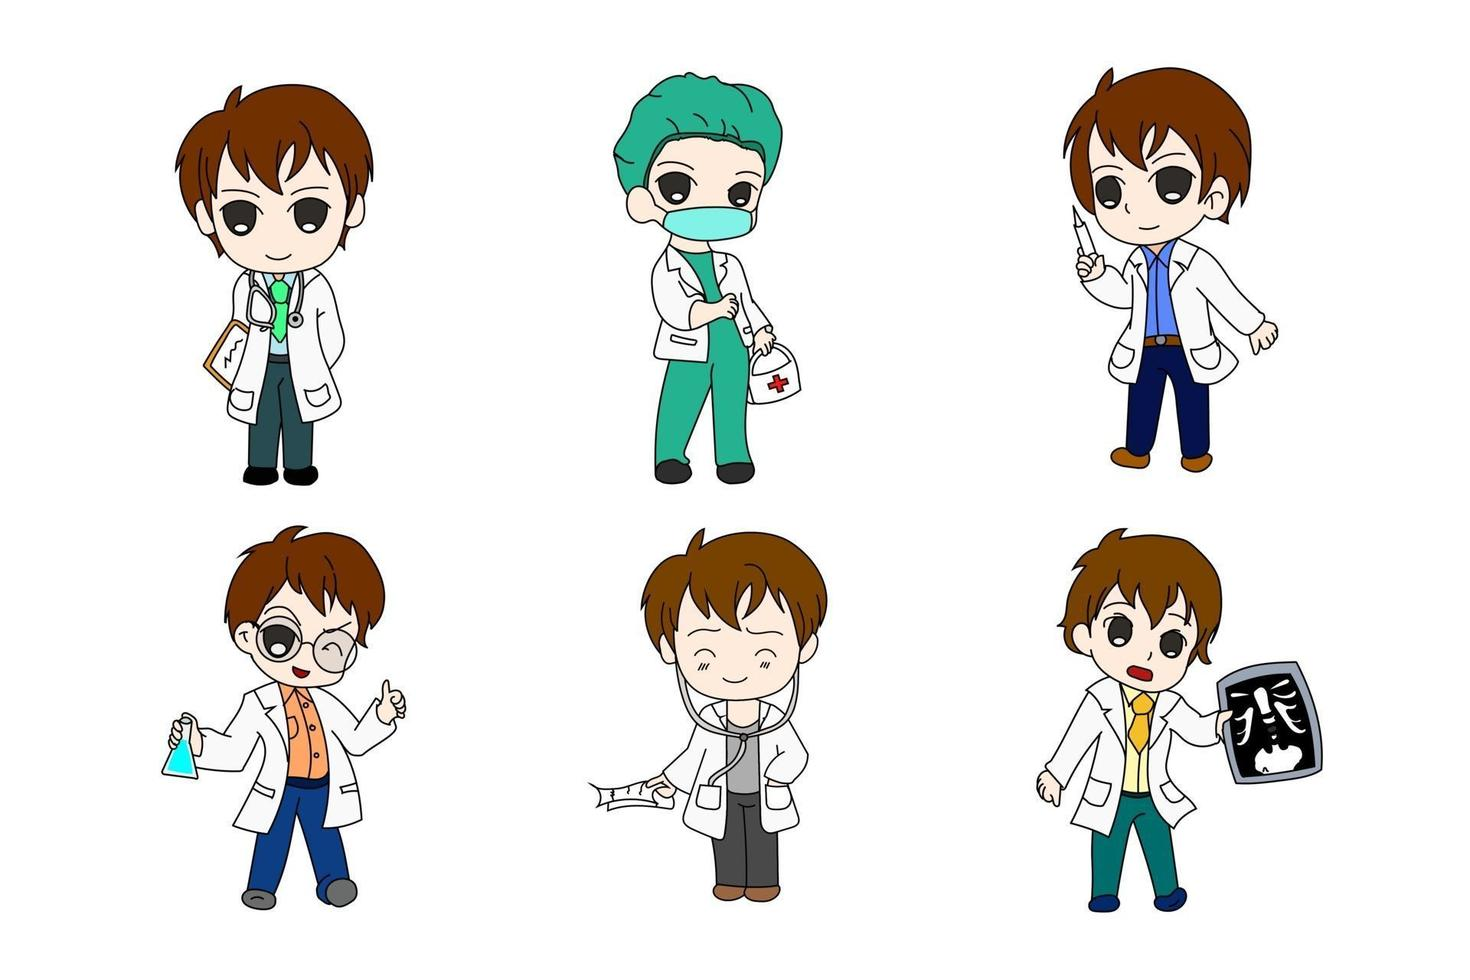 dokter zes bundel anime chi-bi set vector